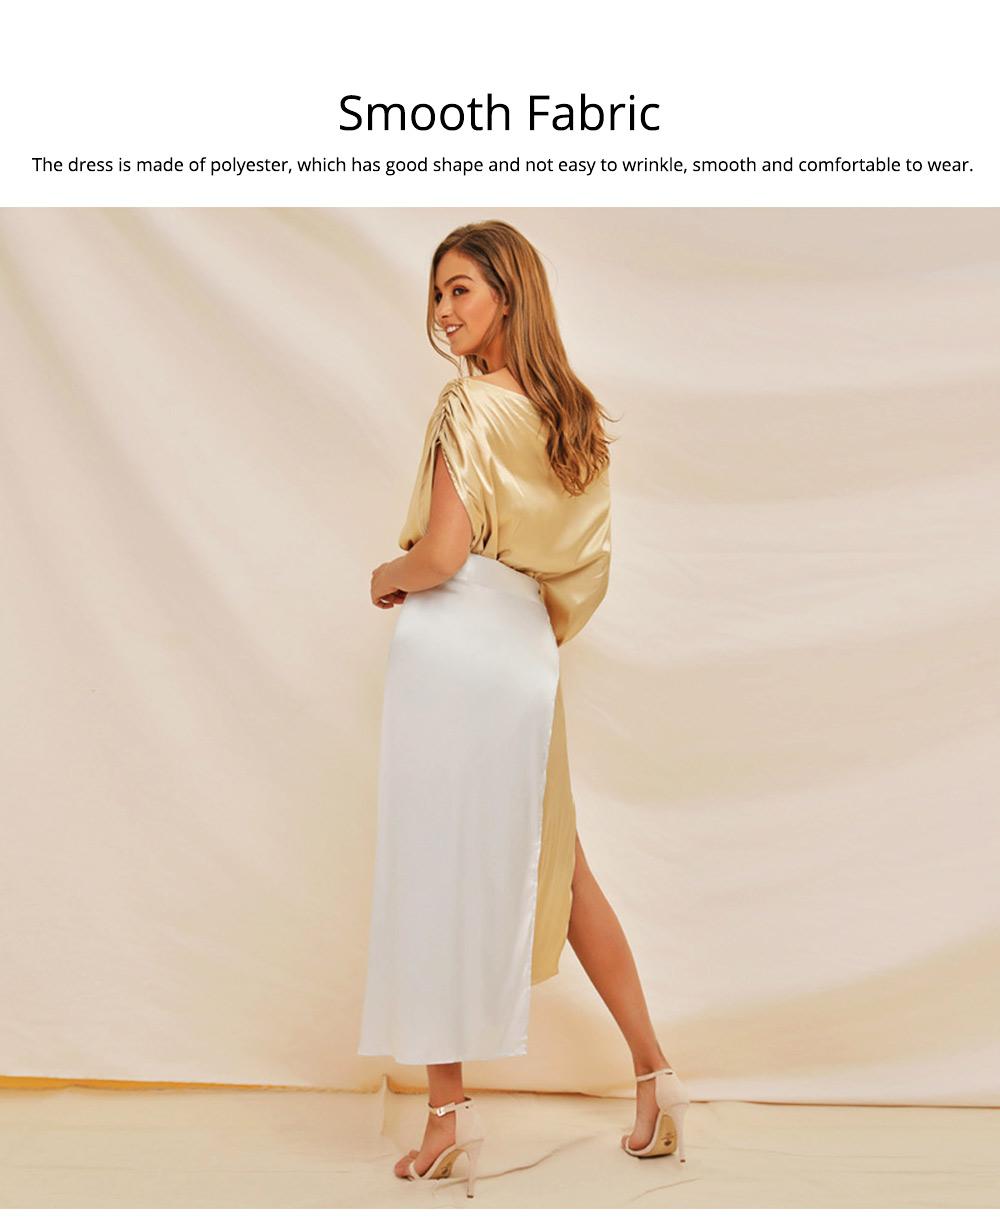 Sloping Shoulder Women Dress, Sexy Fashion Champagne Irregular Casual Dress, High Slit Short Sleeve Elegant Dress 2019 New 1